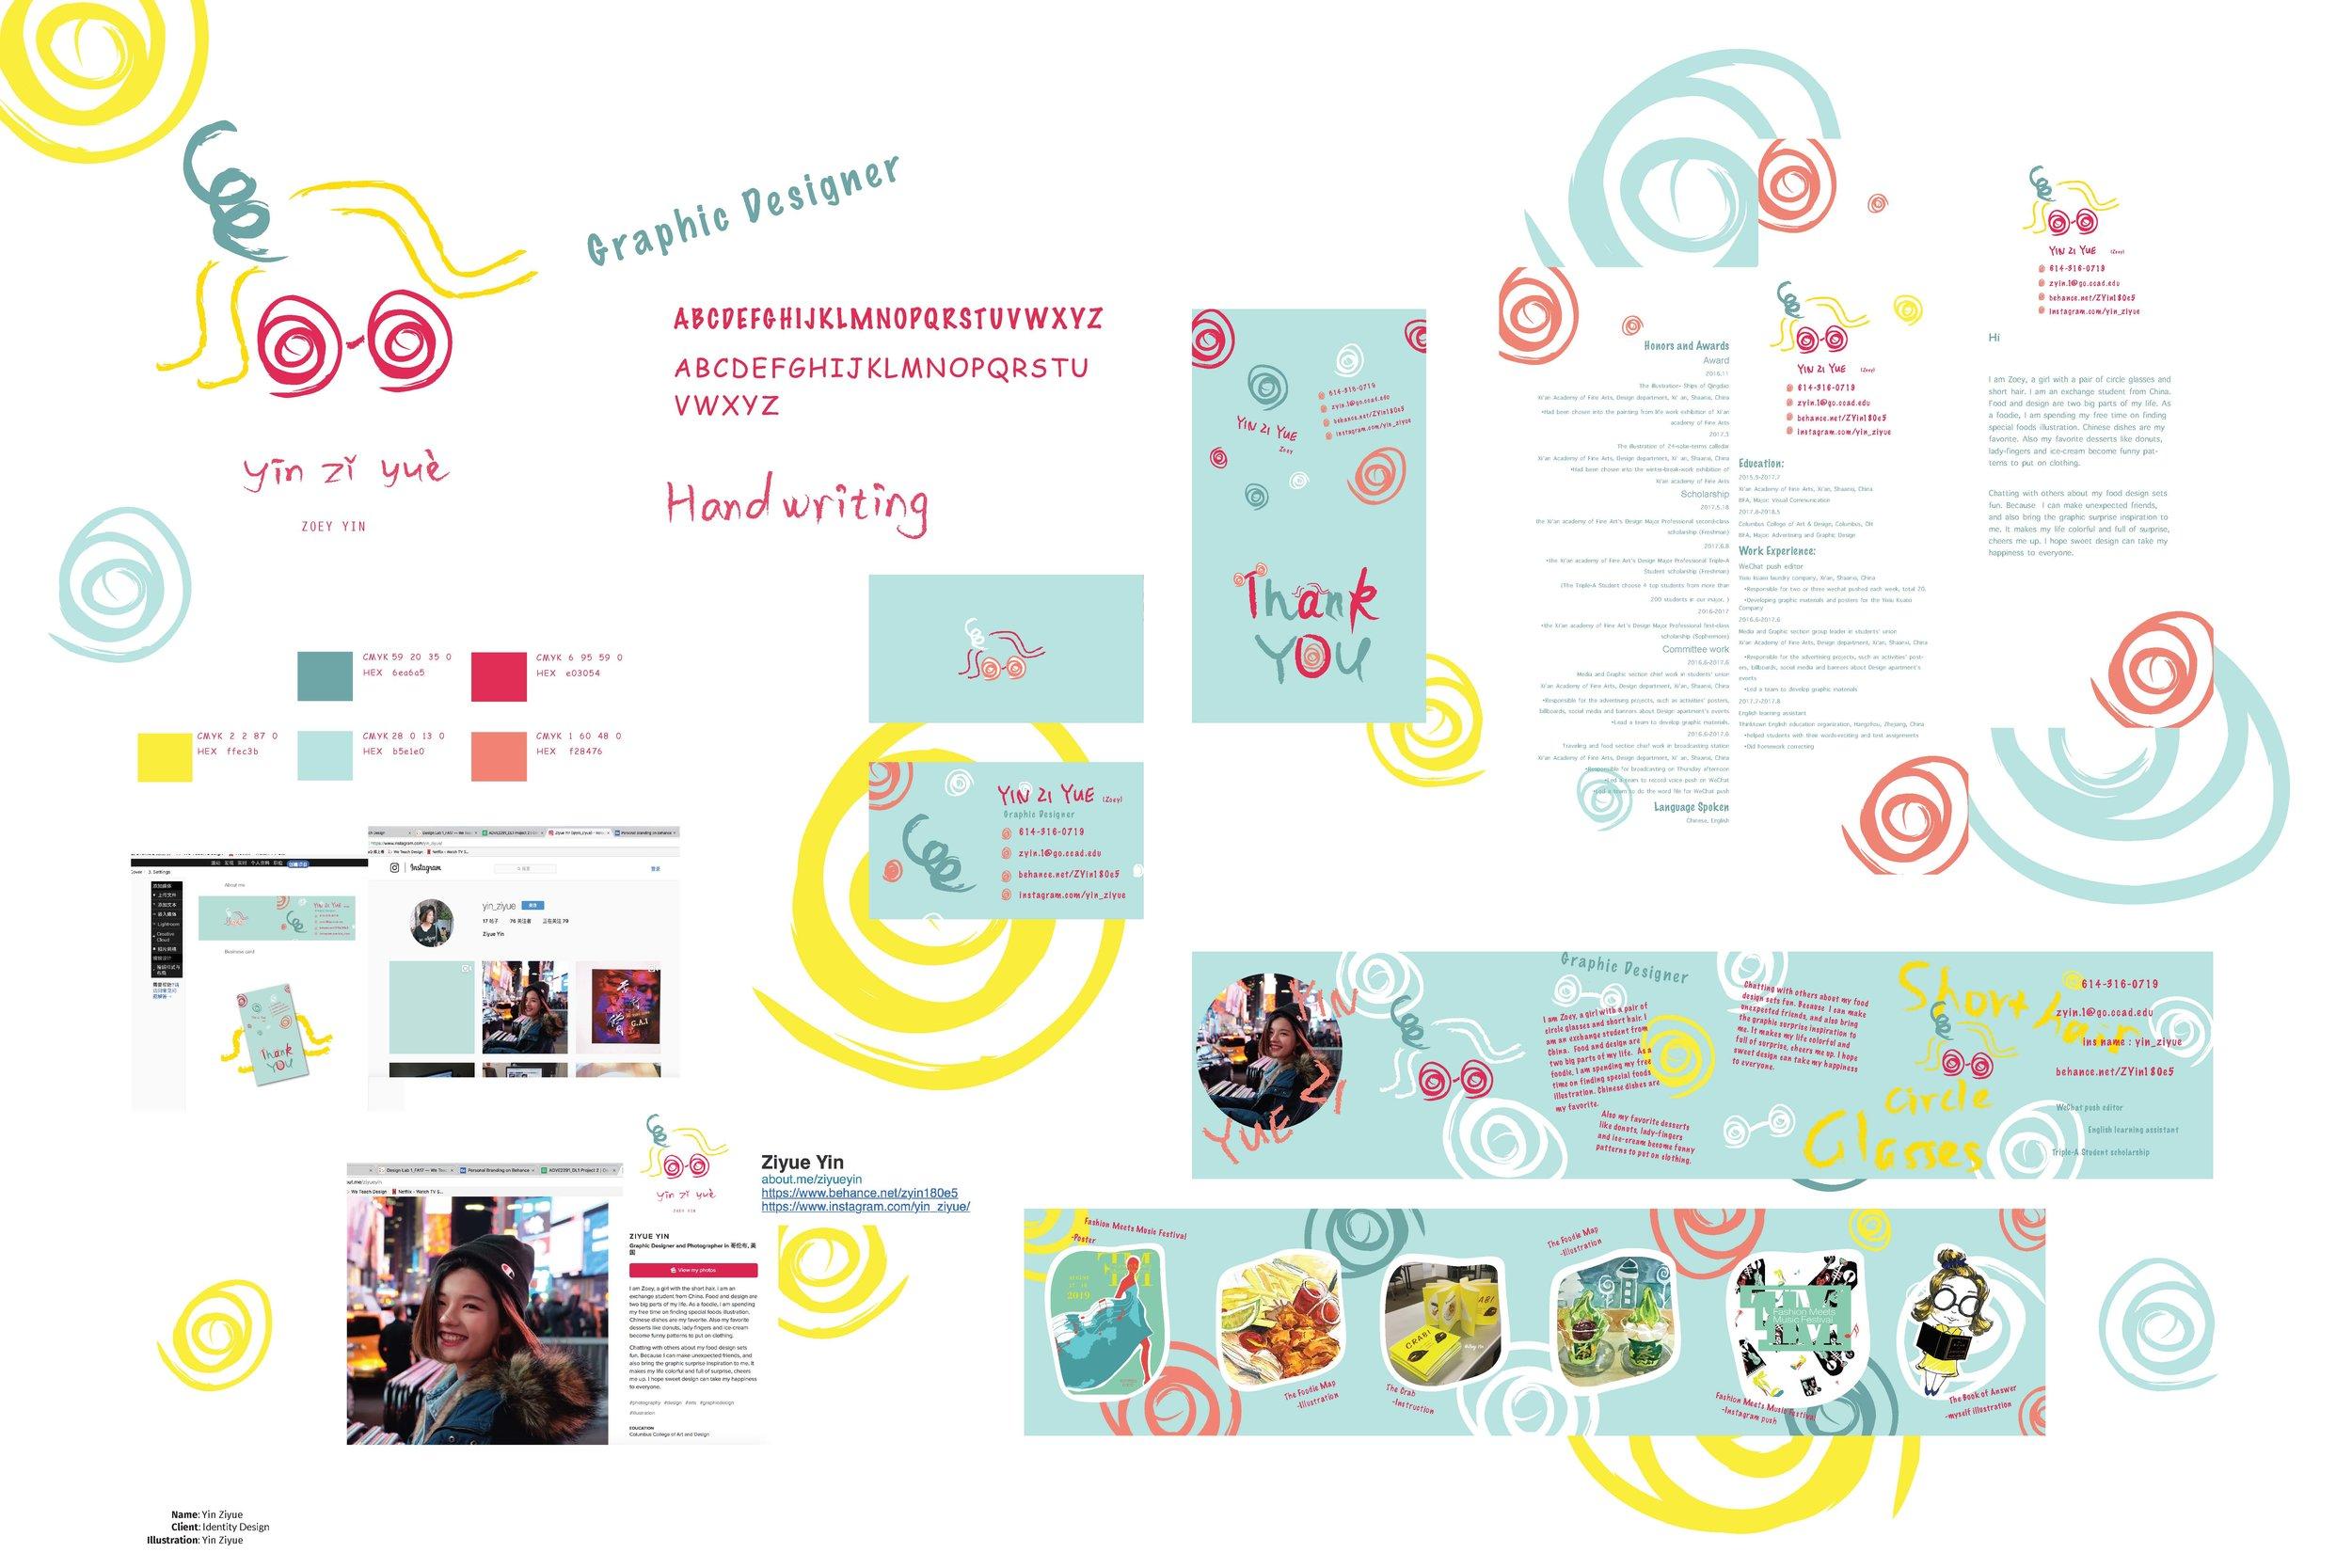 ADVE2291_VGolden_Project_3_Yin Ziyue presentation board_Page_3.jpg